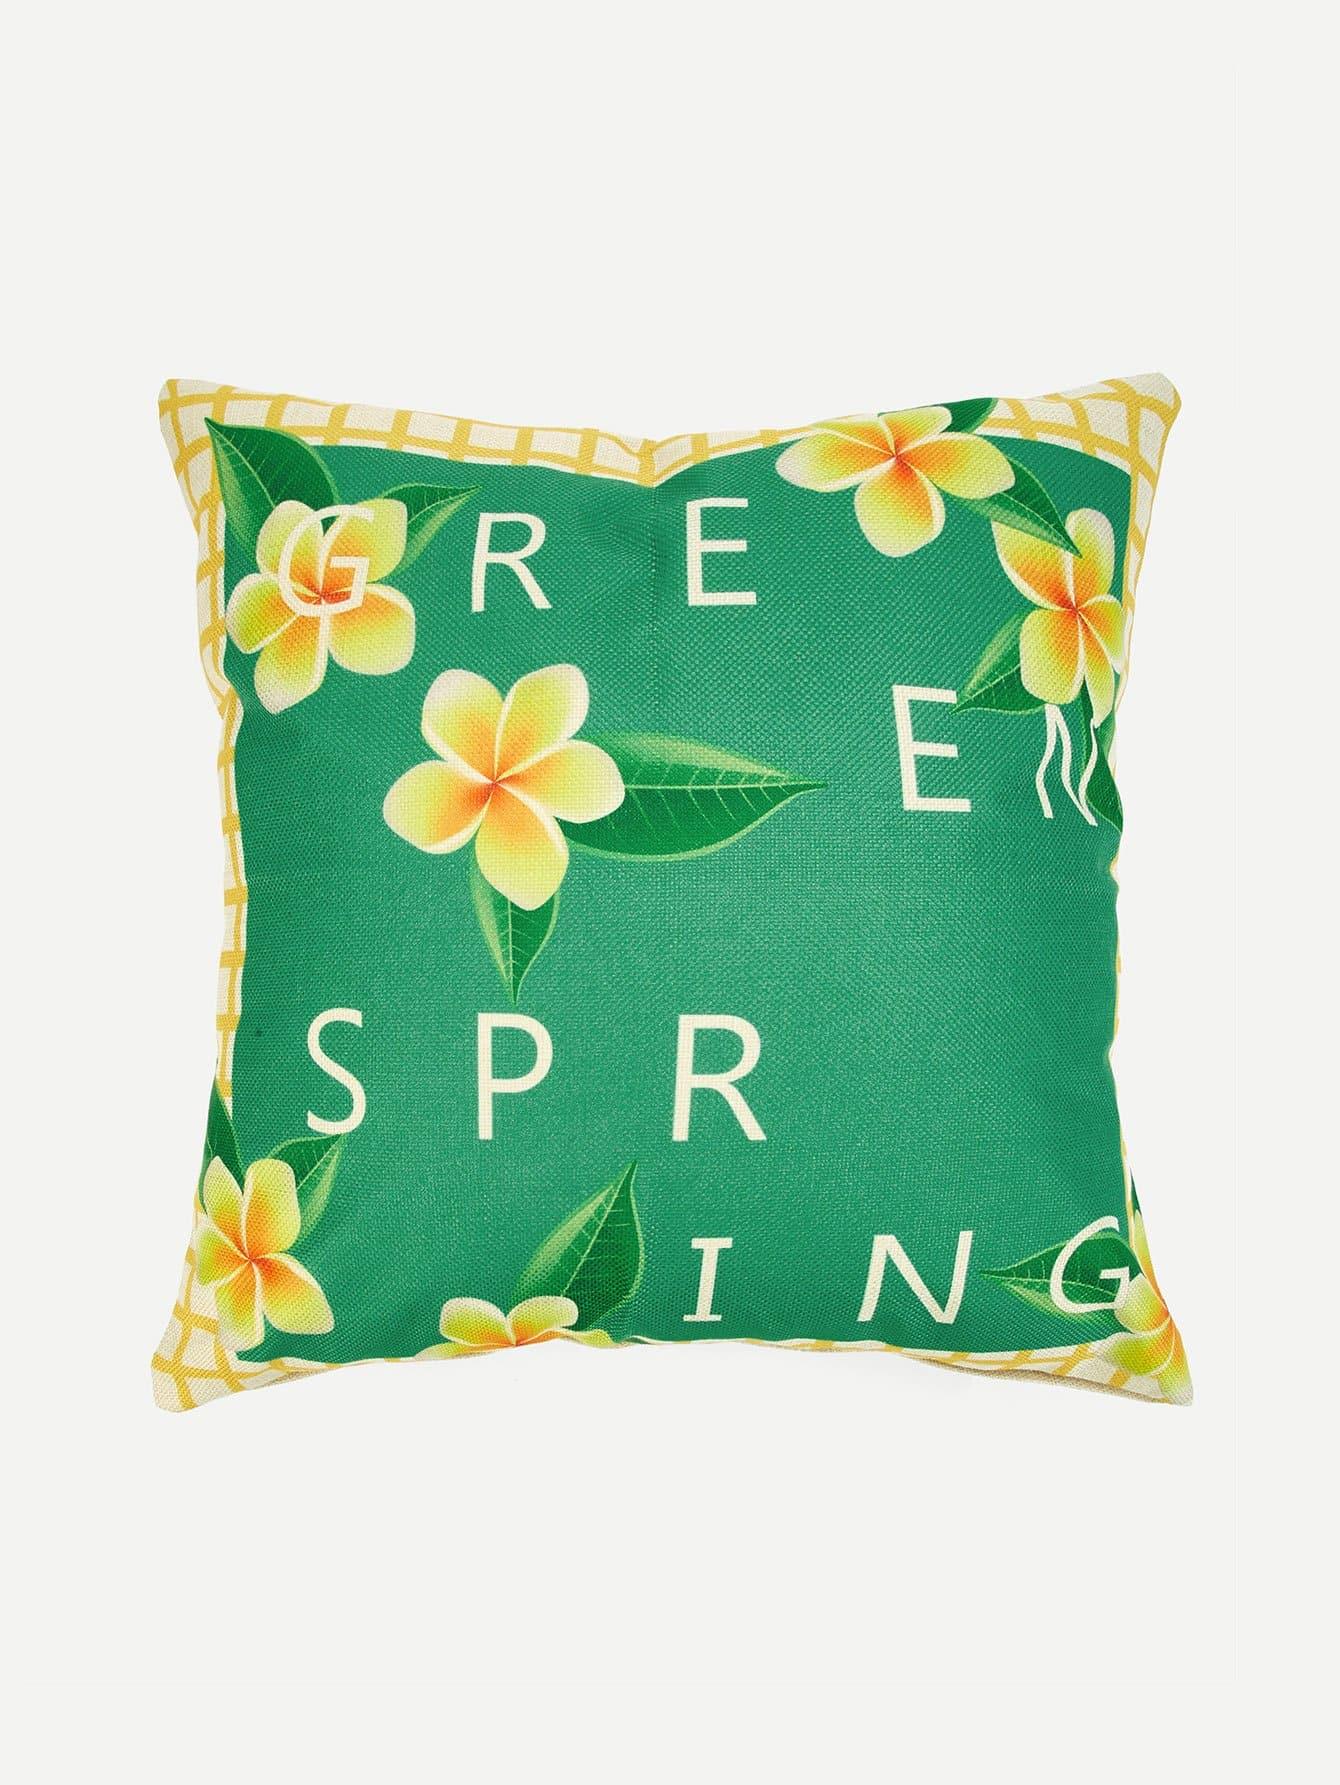 Flower & Letter Pillow Case Cover 1PC leaf pillow case cover 1pc